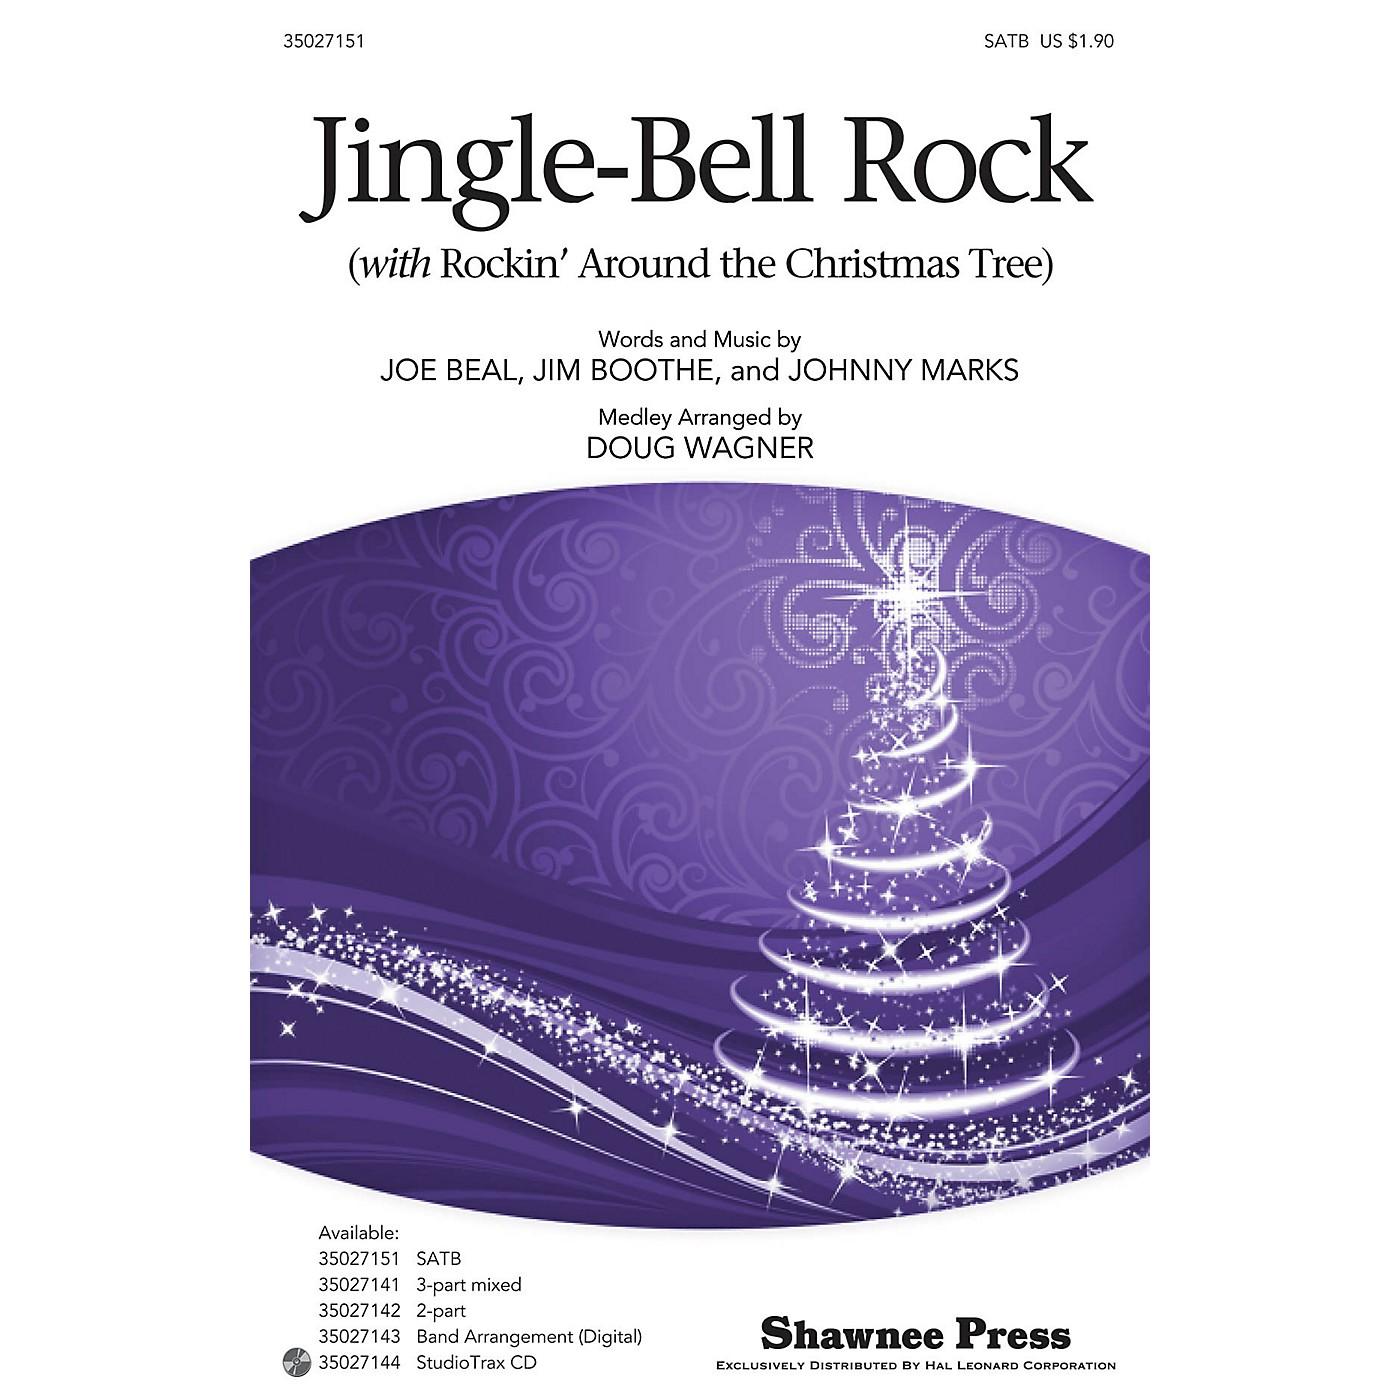 Hal Leonard Jingle-Bell Rock (with Rockin' Around the Christmas Tree) Studiotrax CD Arranged by Douglas Wagner thumbnail